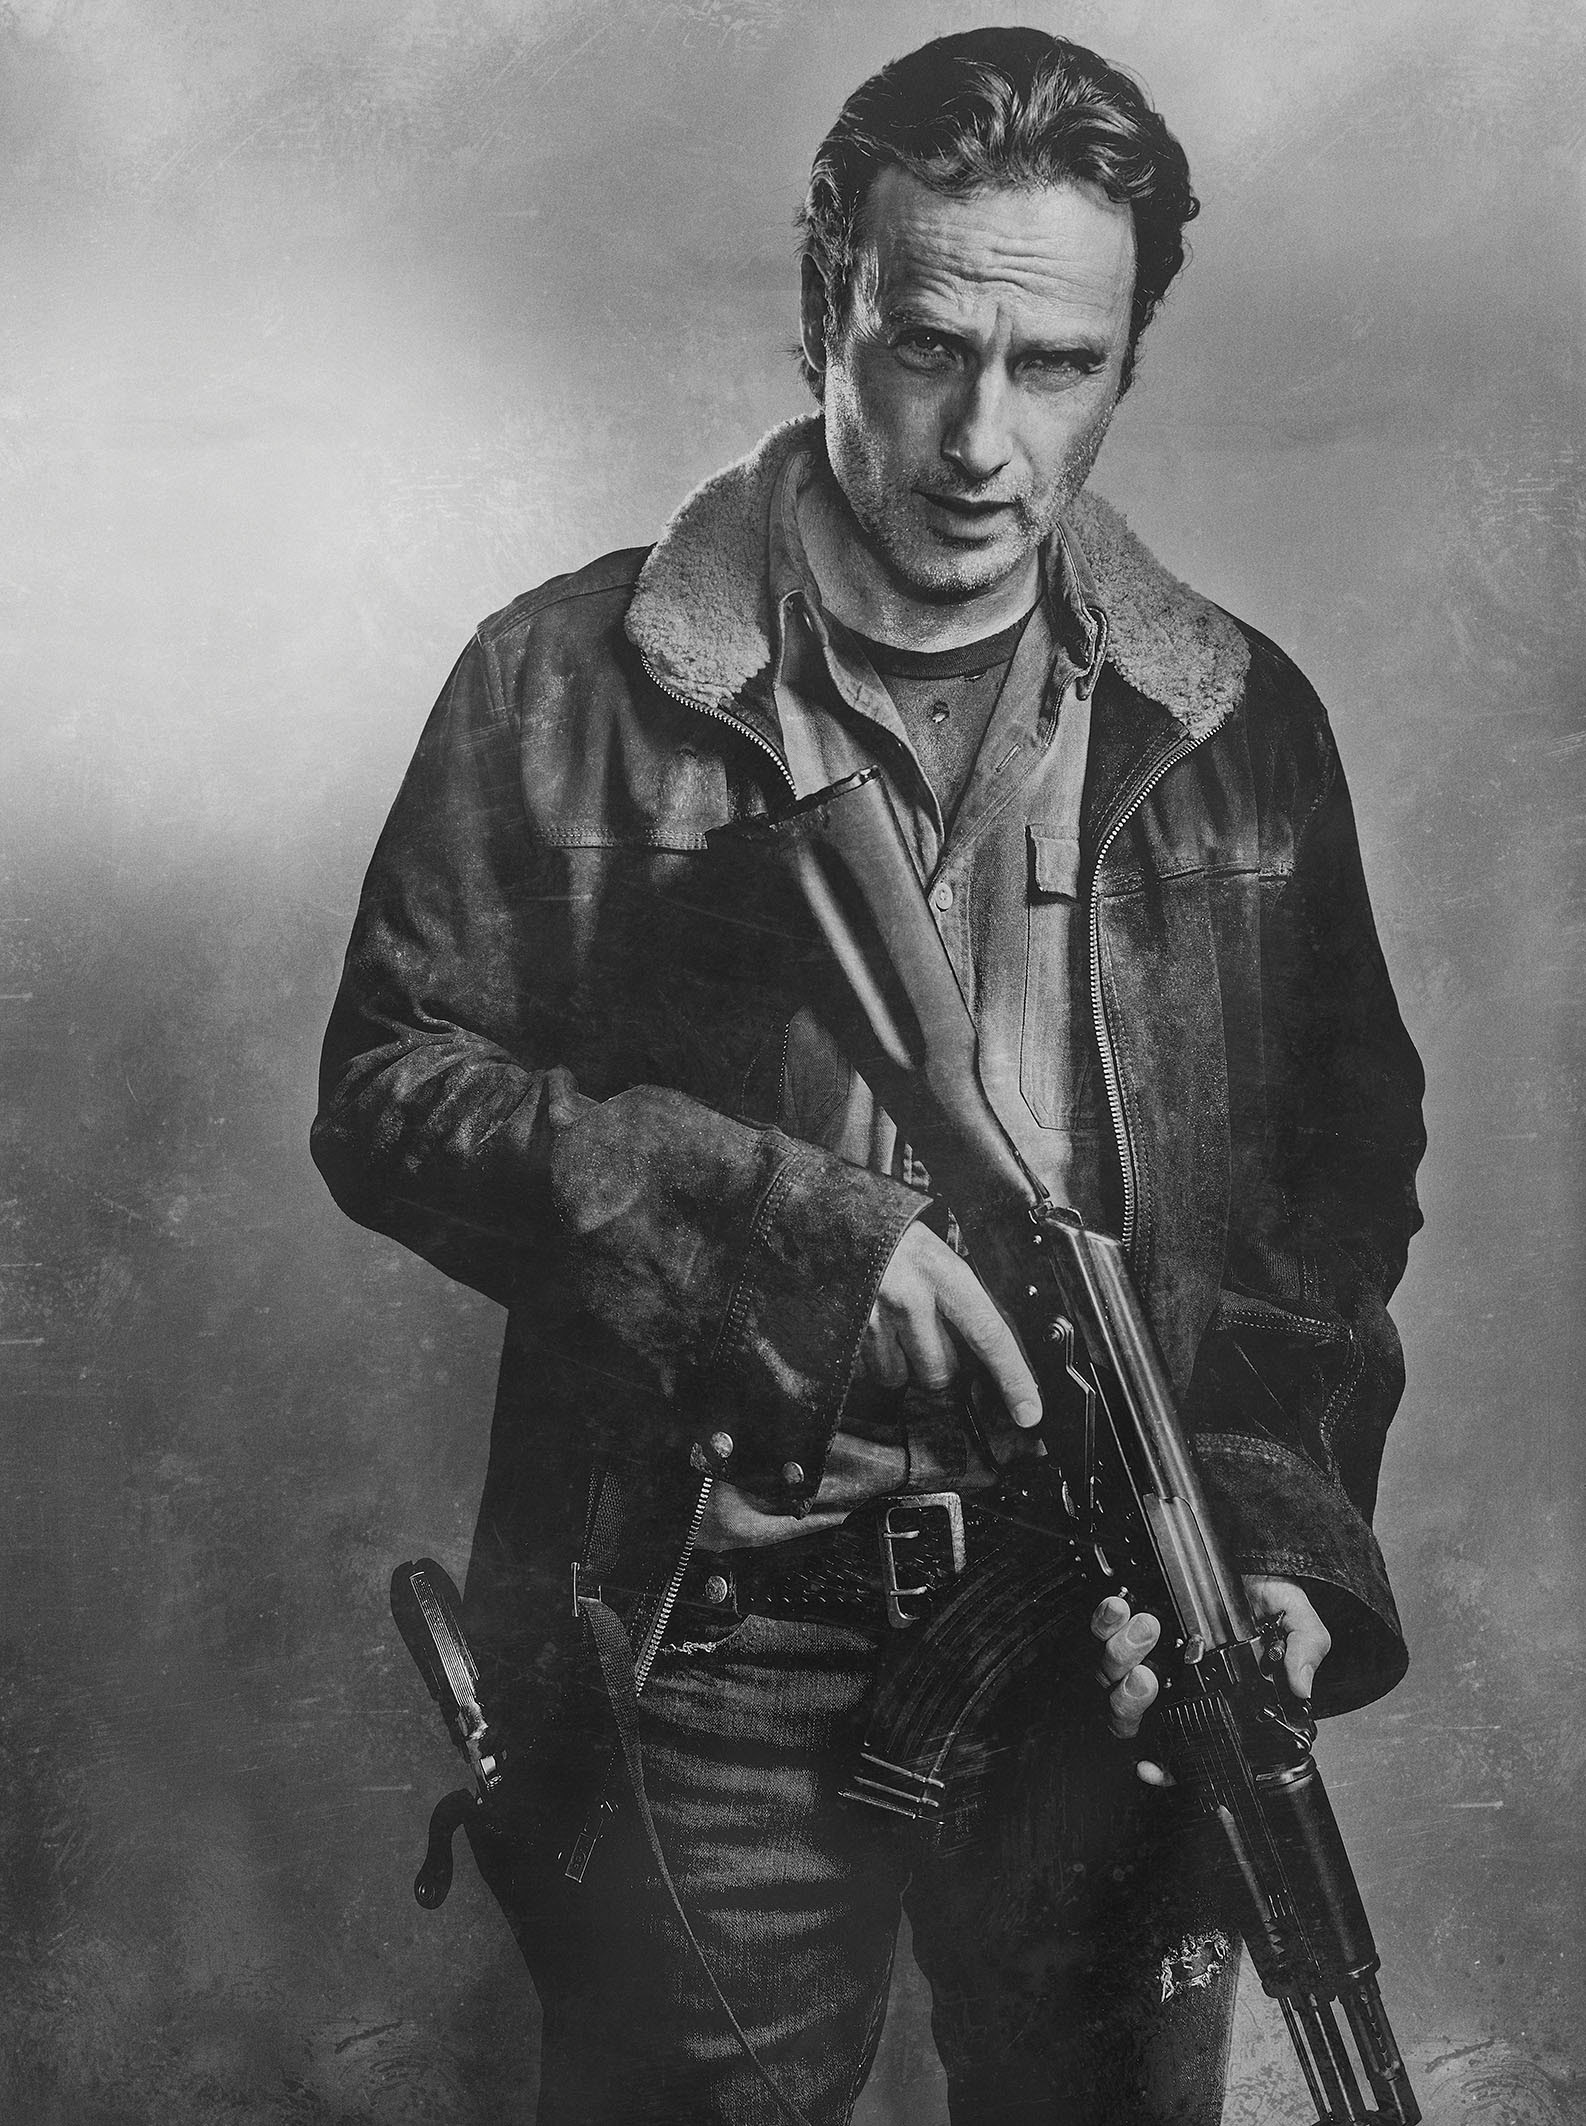 Season 6 Character Portrait Rick Grimes Walking Dead Photo